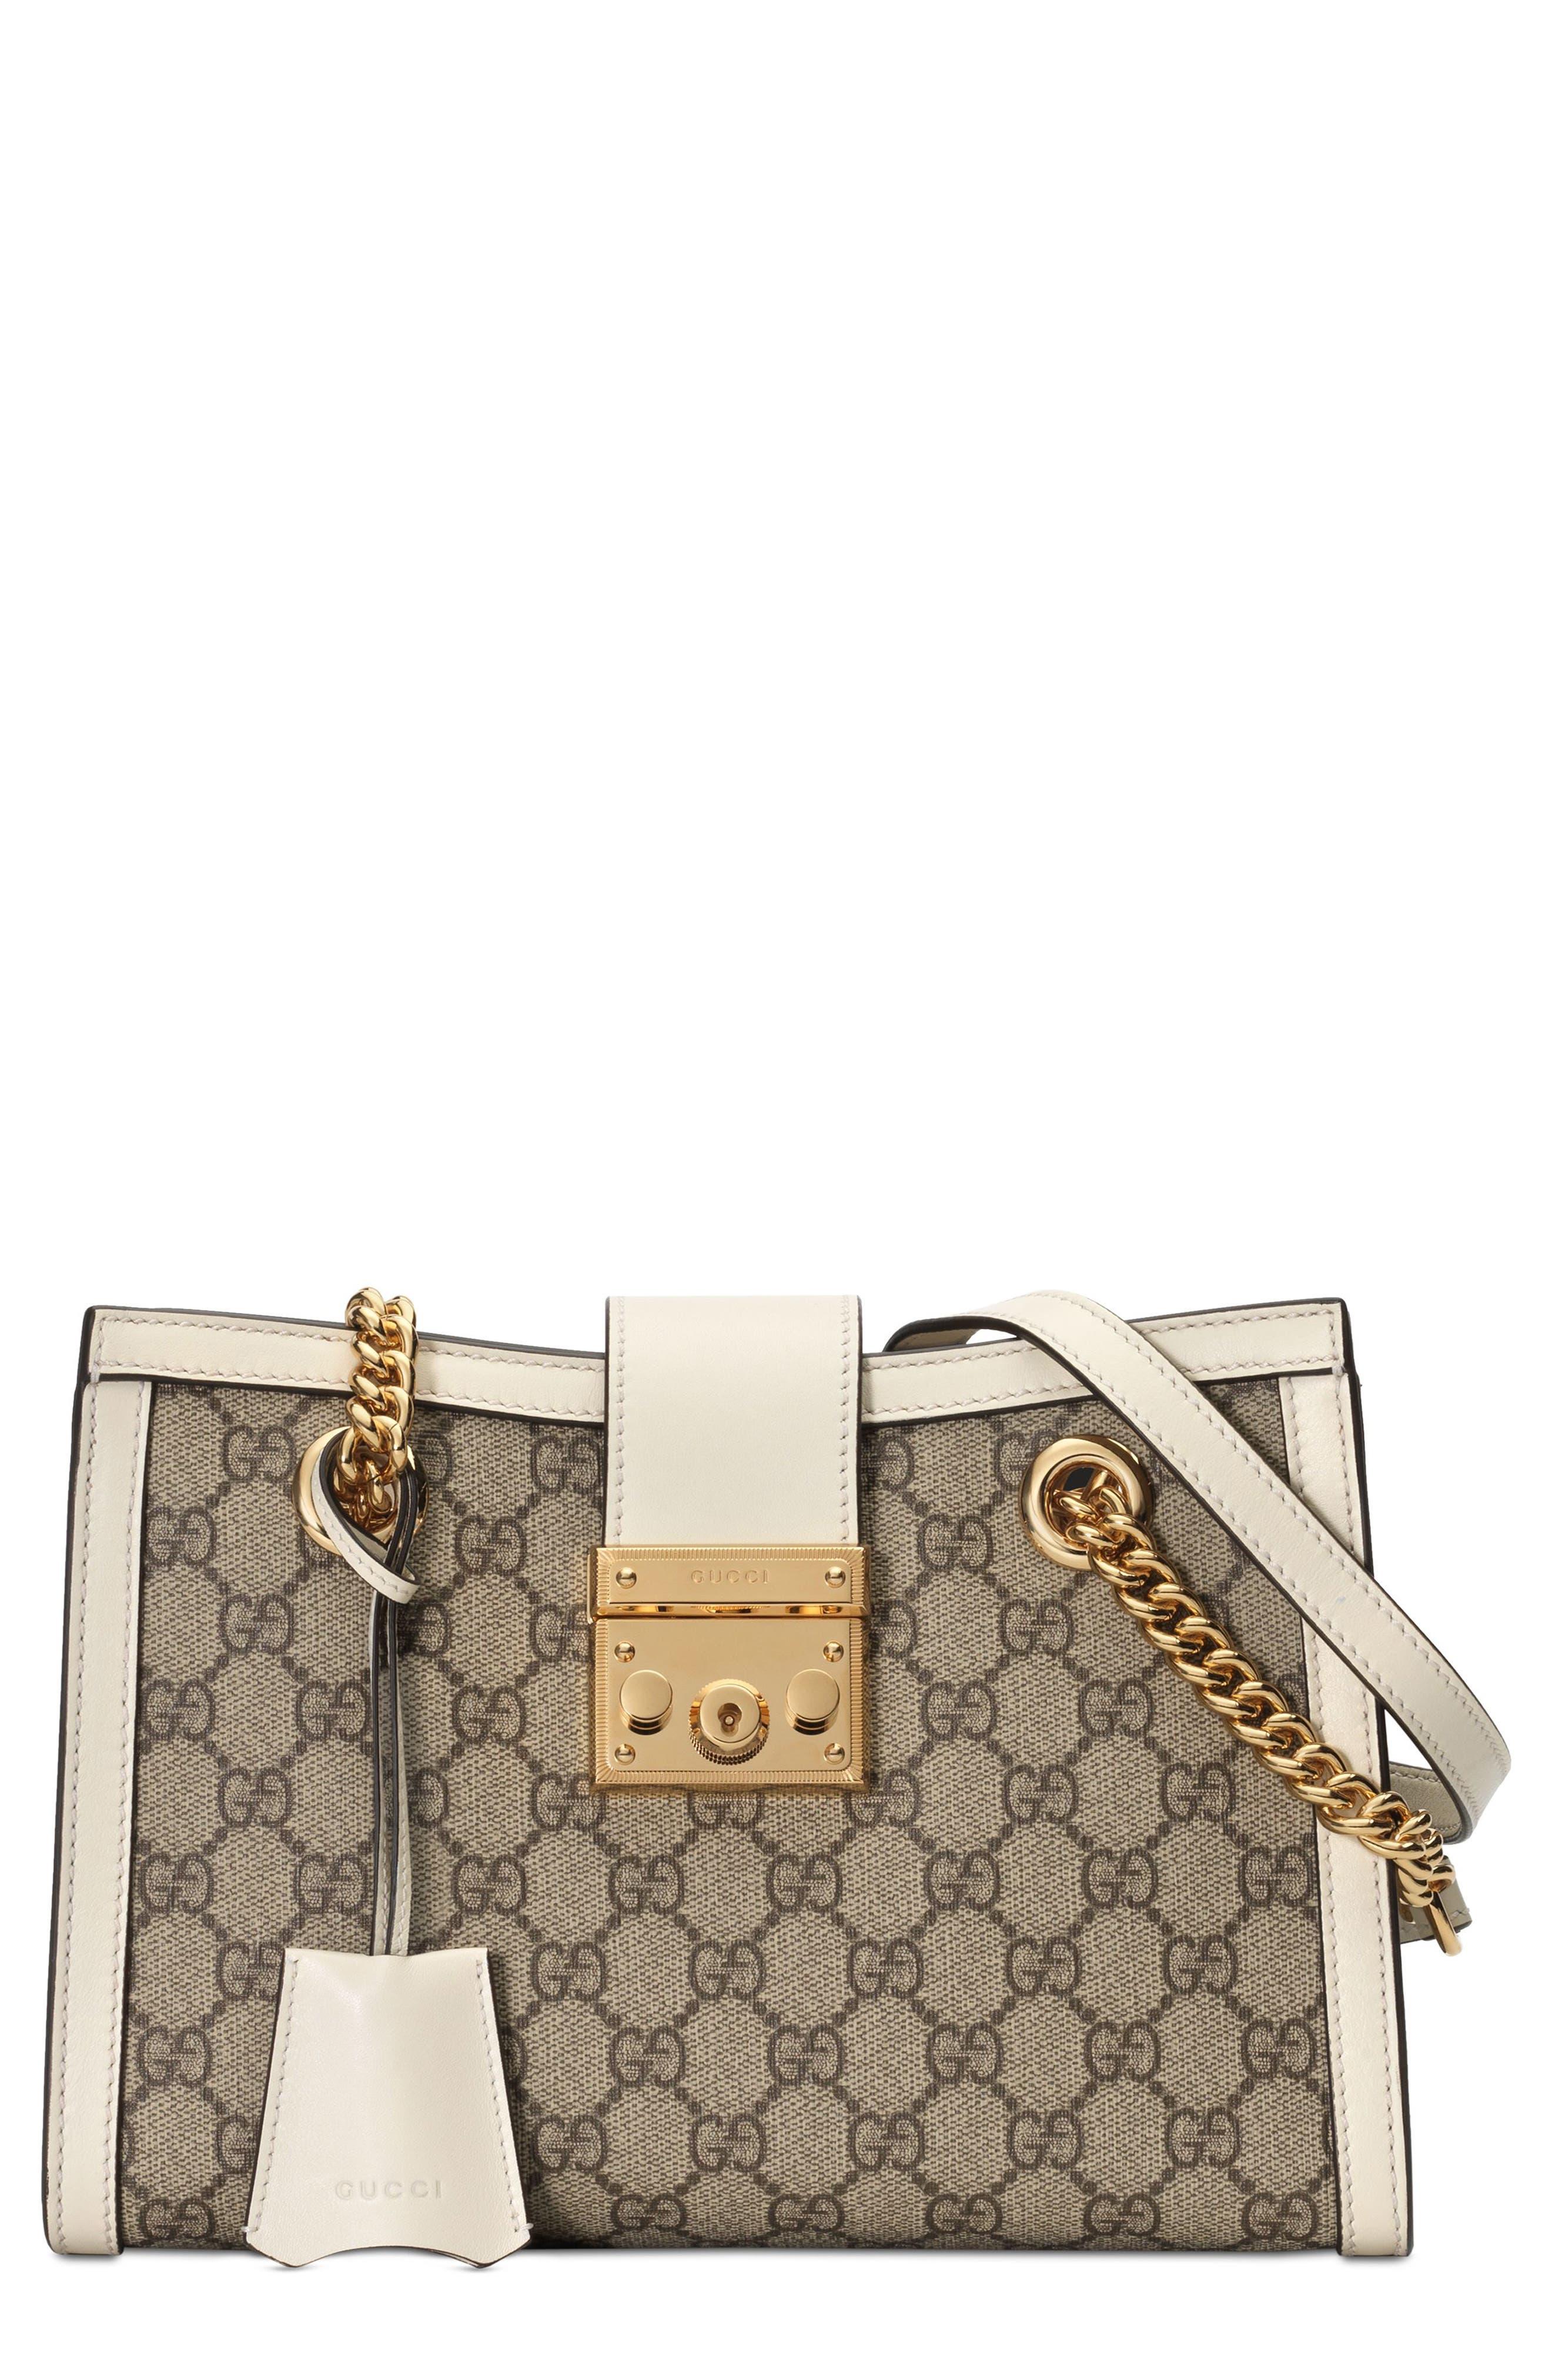 Small Padlock GG Supreme Shoulder Bag,                             Main thumbnail 1, color,                             BEIGE EBONY/ MYSTIC WHITE